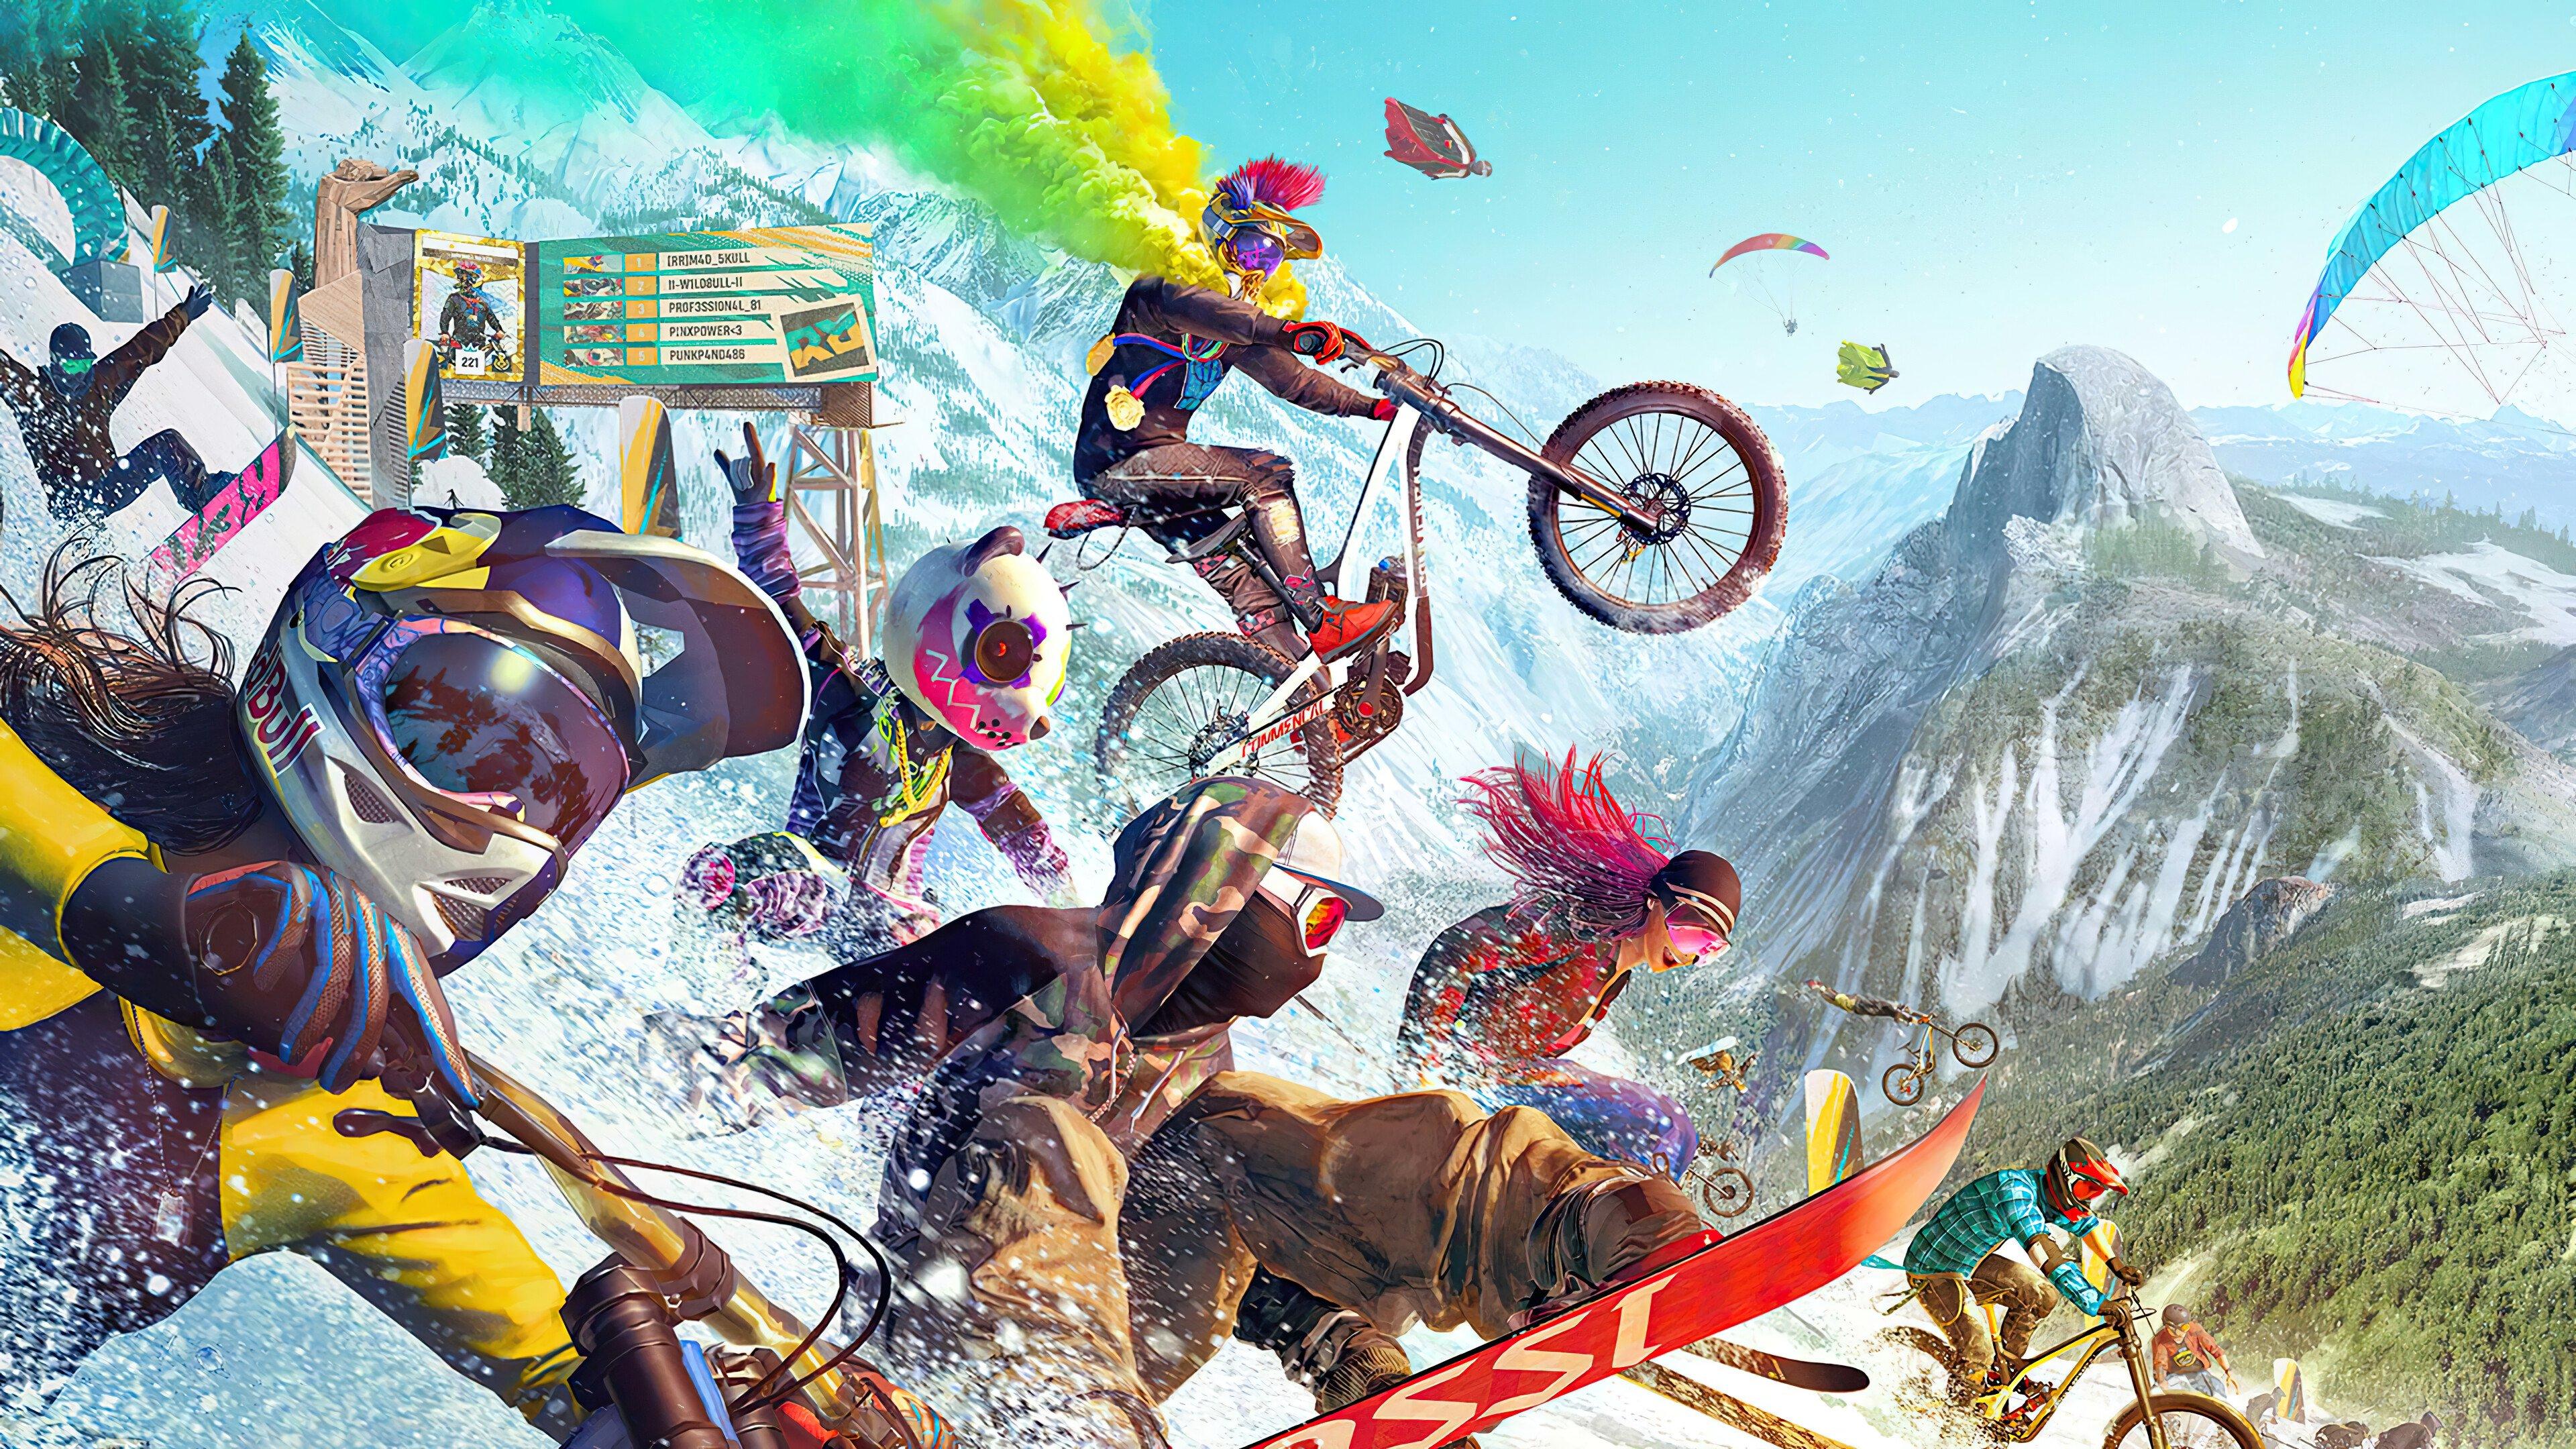 Fondos de pantalla Riders Republic Extreme Sports